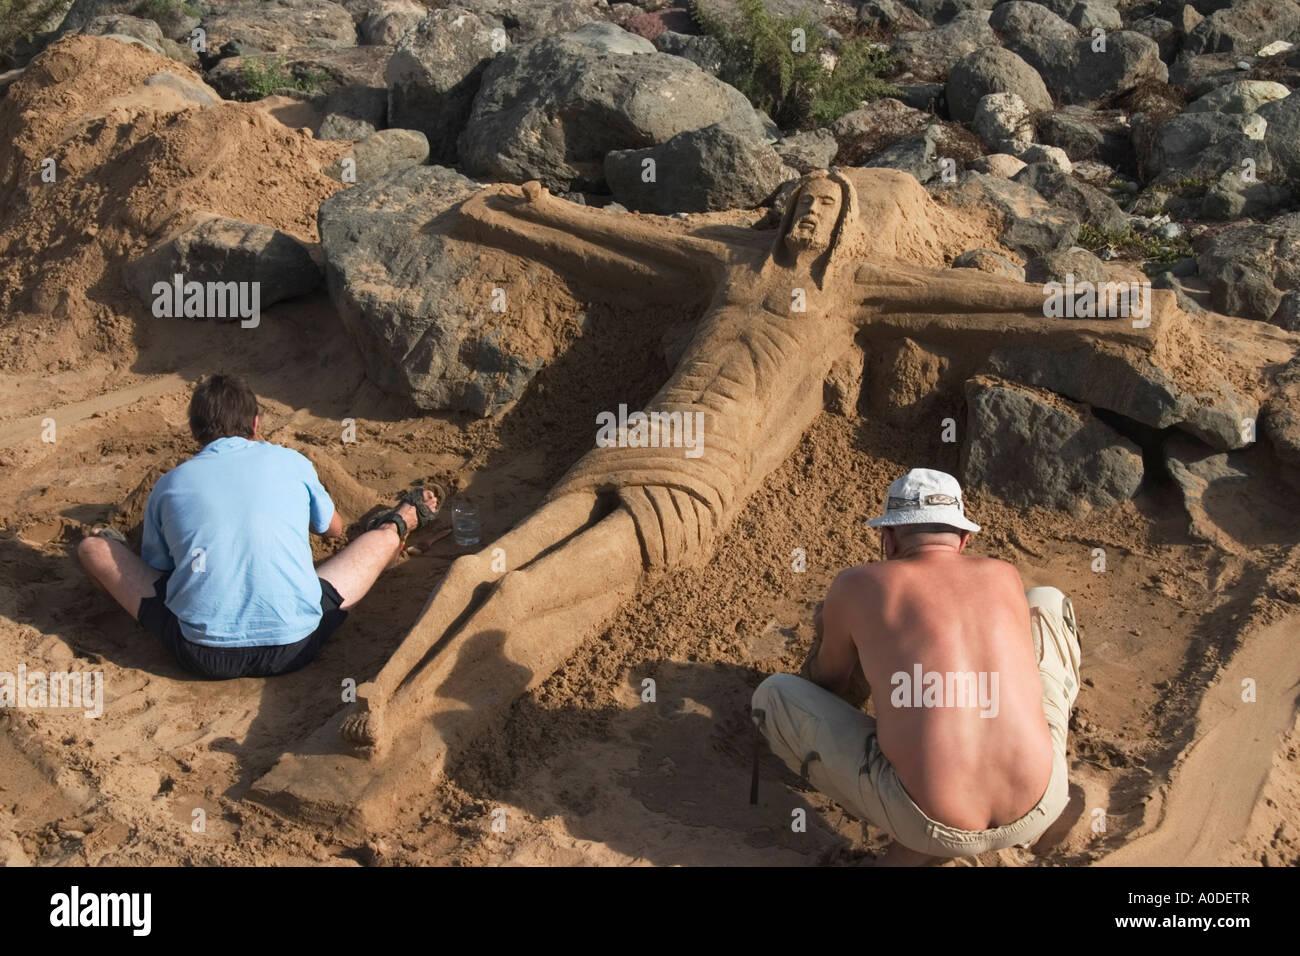 Sand sculptors working - Stock Image